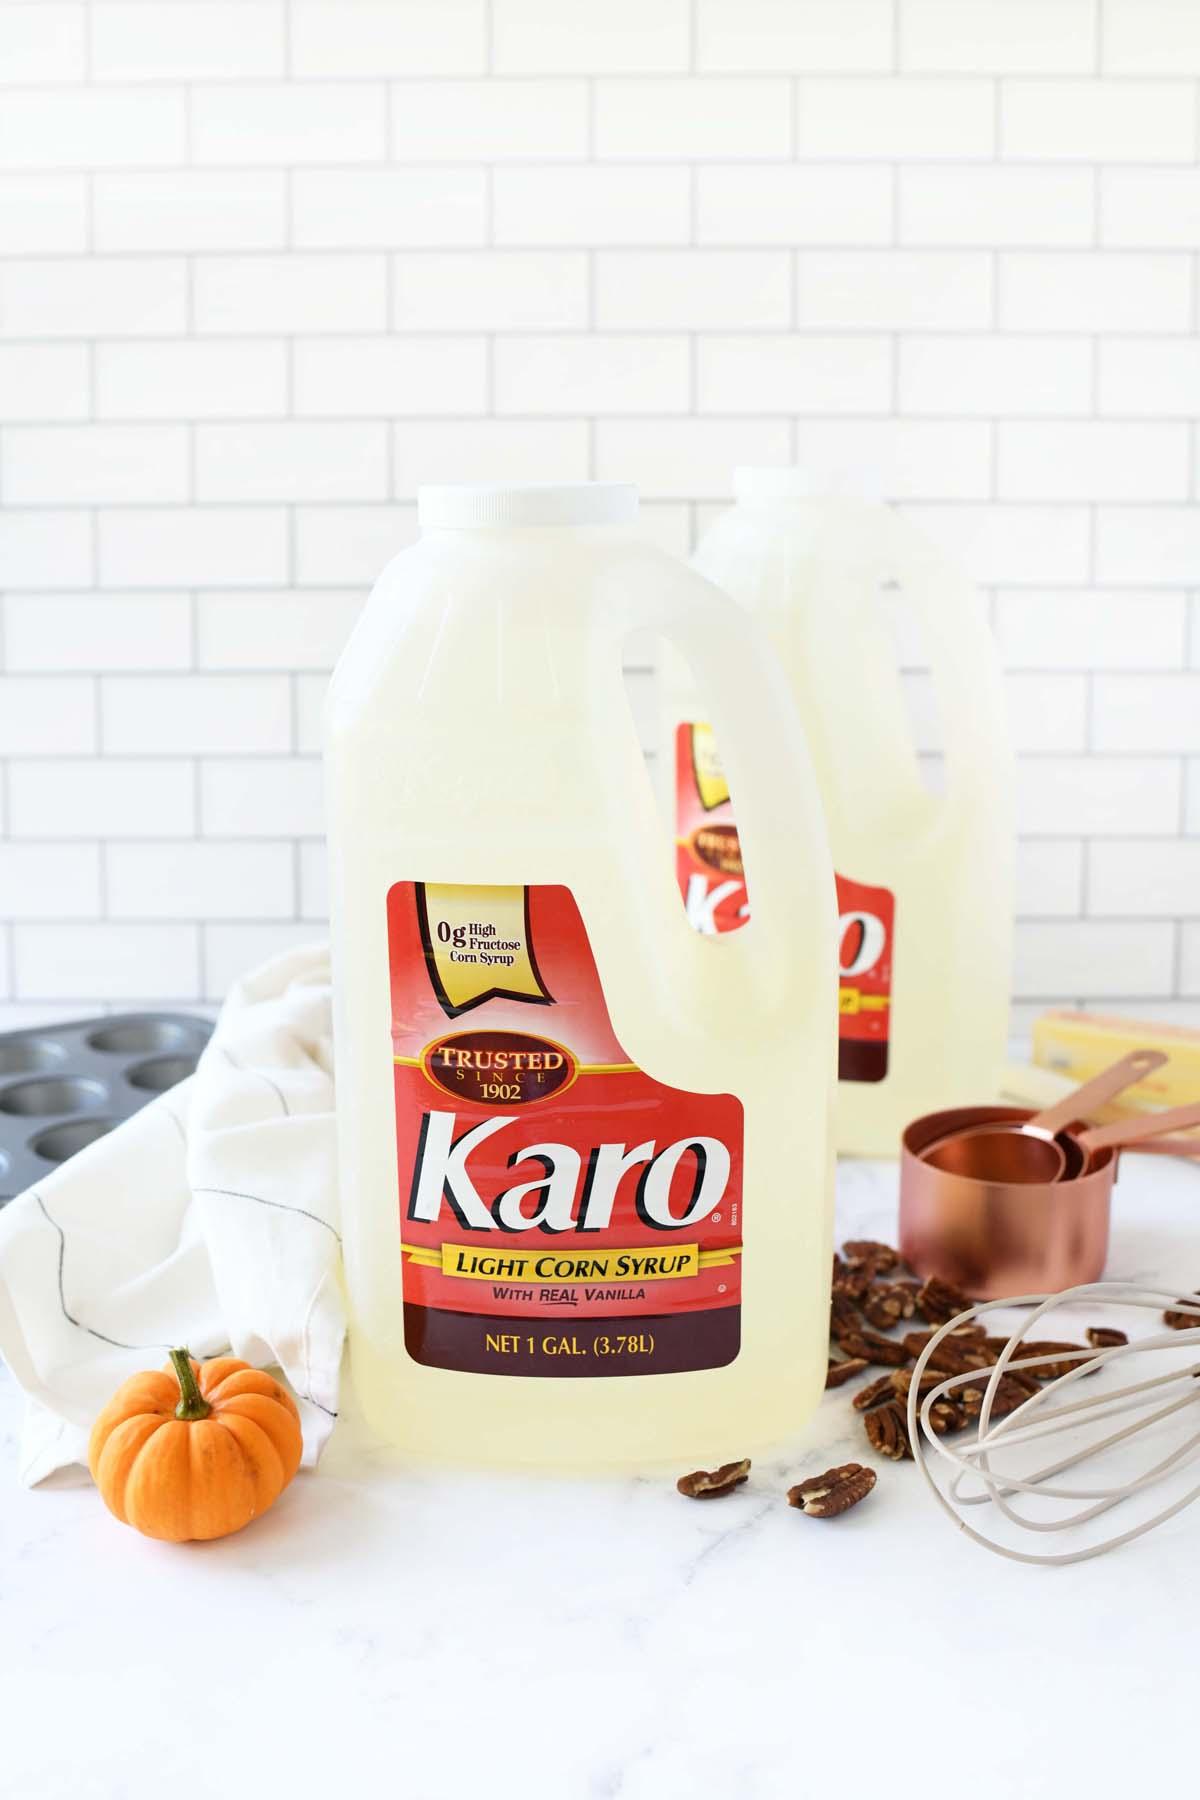 Karo Corn Syrup jugs on a white table near a mini pumpkin.